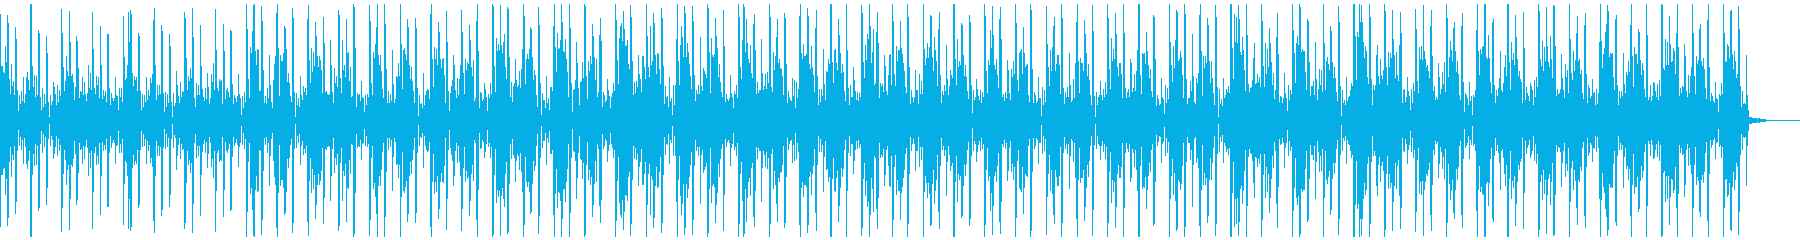 IT、科学、説明、ニュース、アンビエントの再生済みの波形